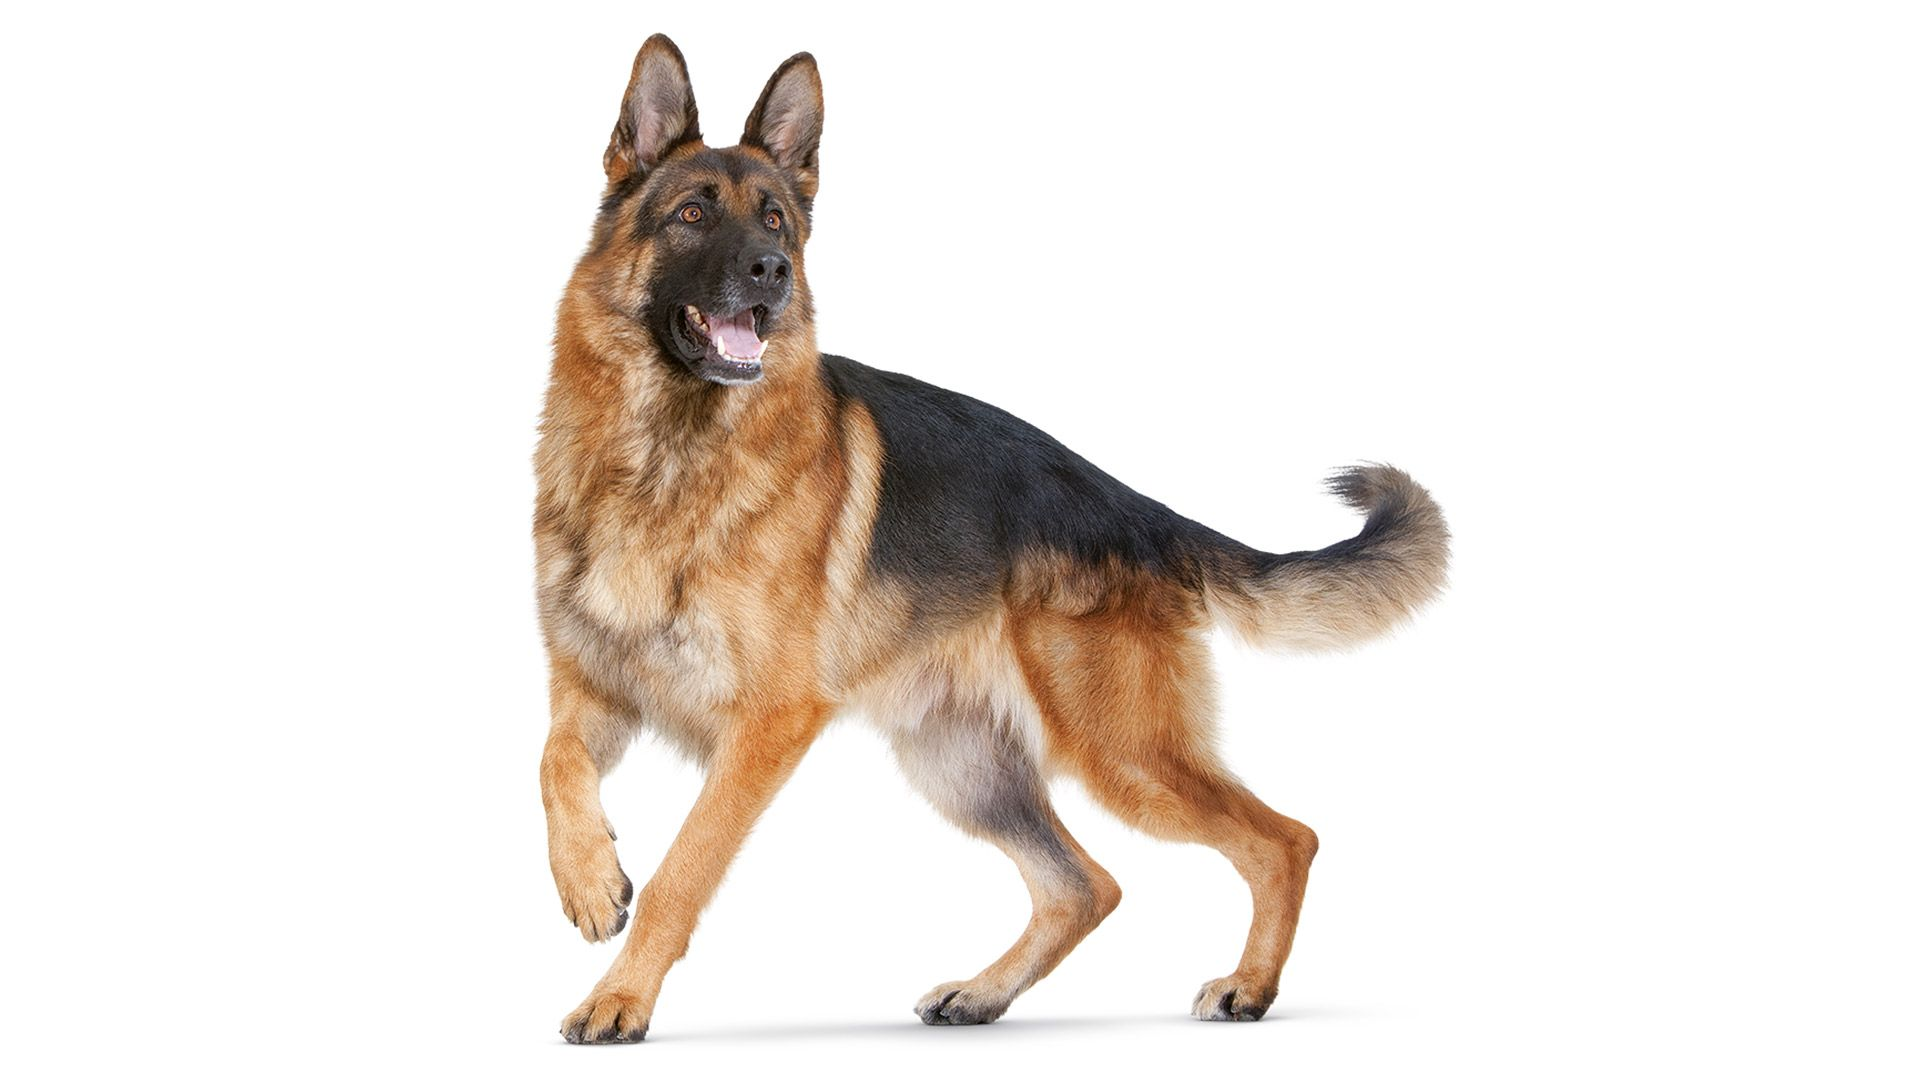 German Shepherd 1920x1080 Jpg 1920 1080 Dog Training Obedience